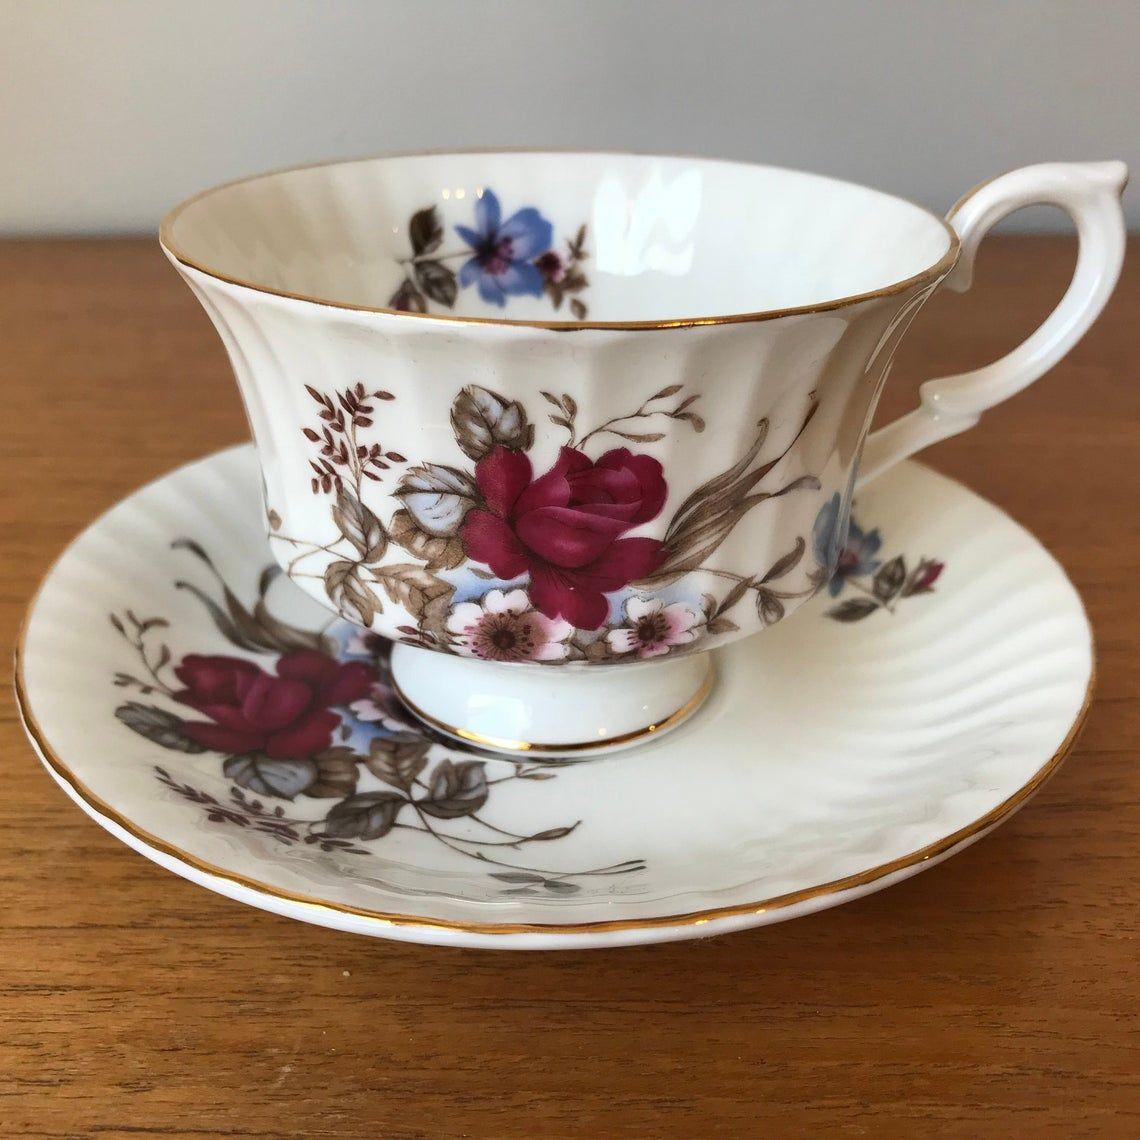 Paragon Rose Tea Cup and Saucer, Dark Pink and Blue Floral Bone China Teacup and Saucer